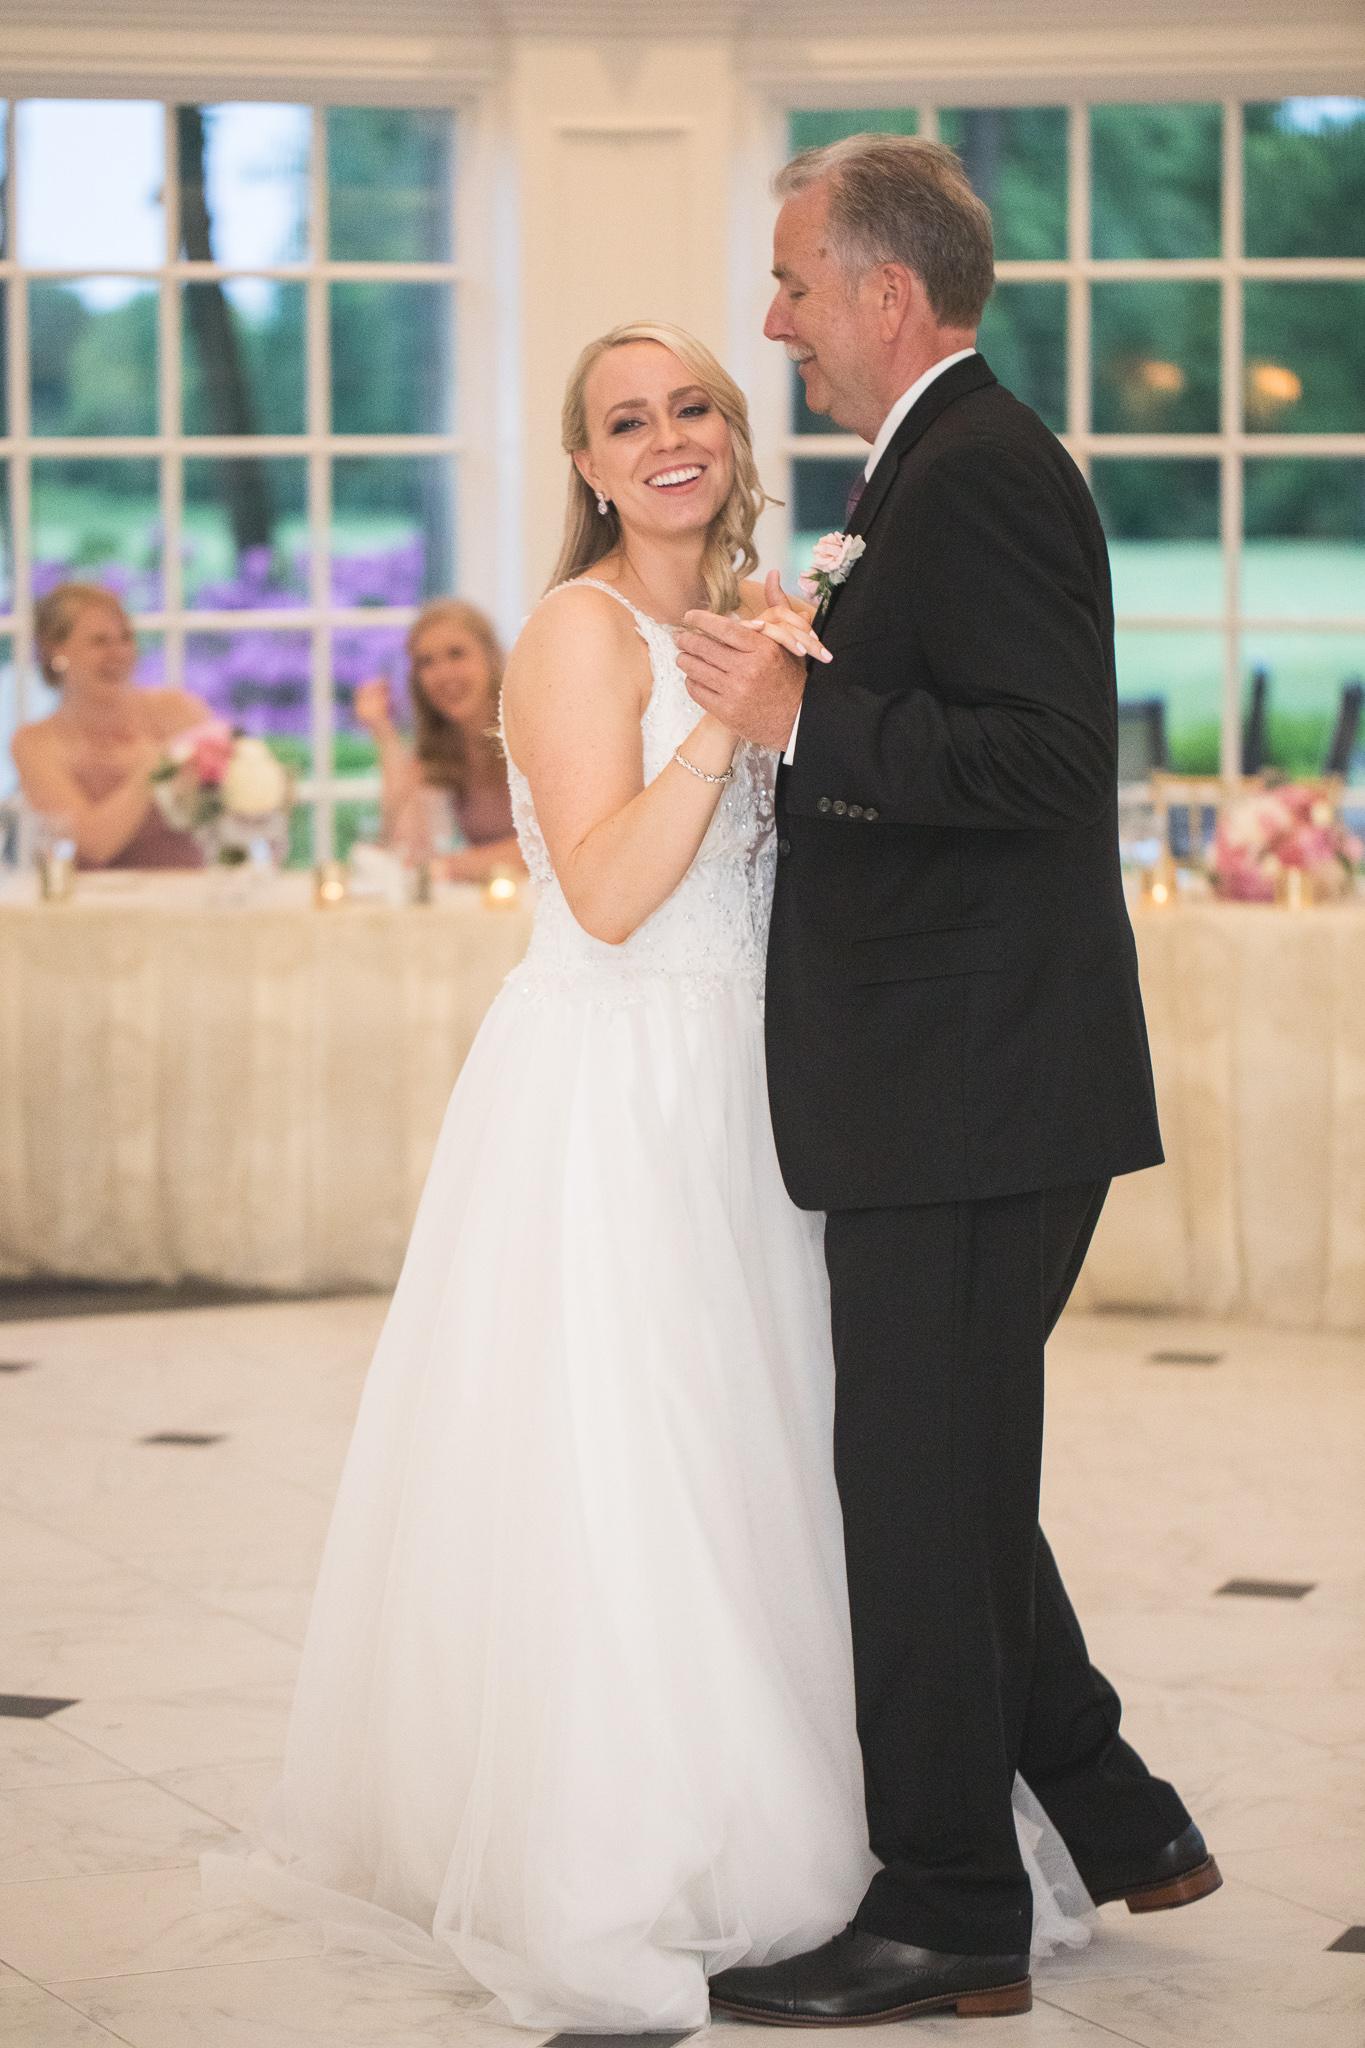 169-best-detroit-michigan-outdoor-wedding-photographer.jpg